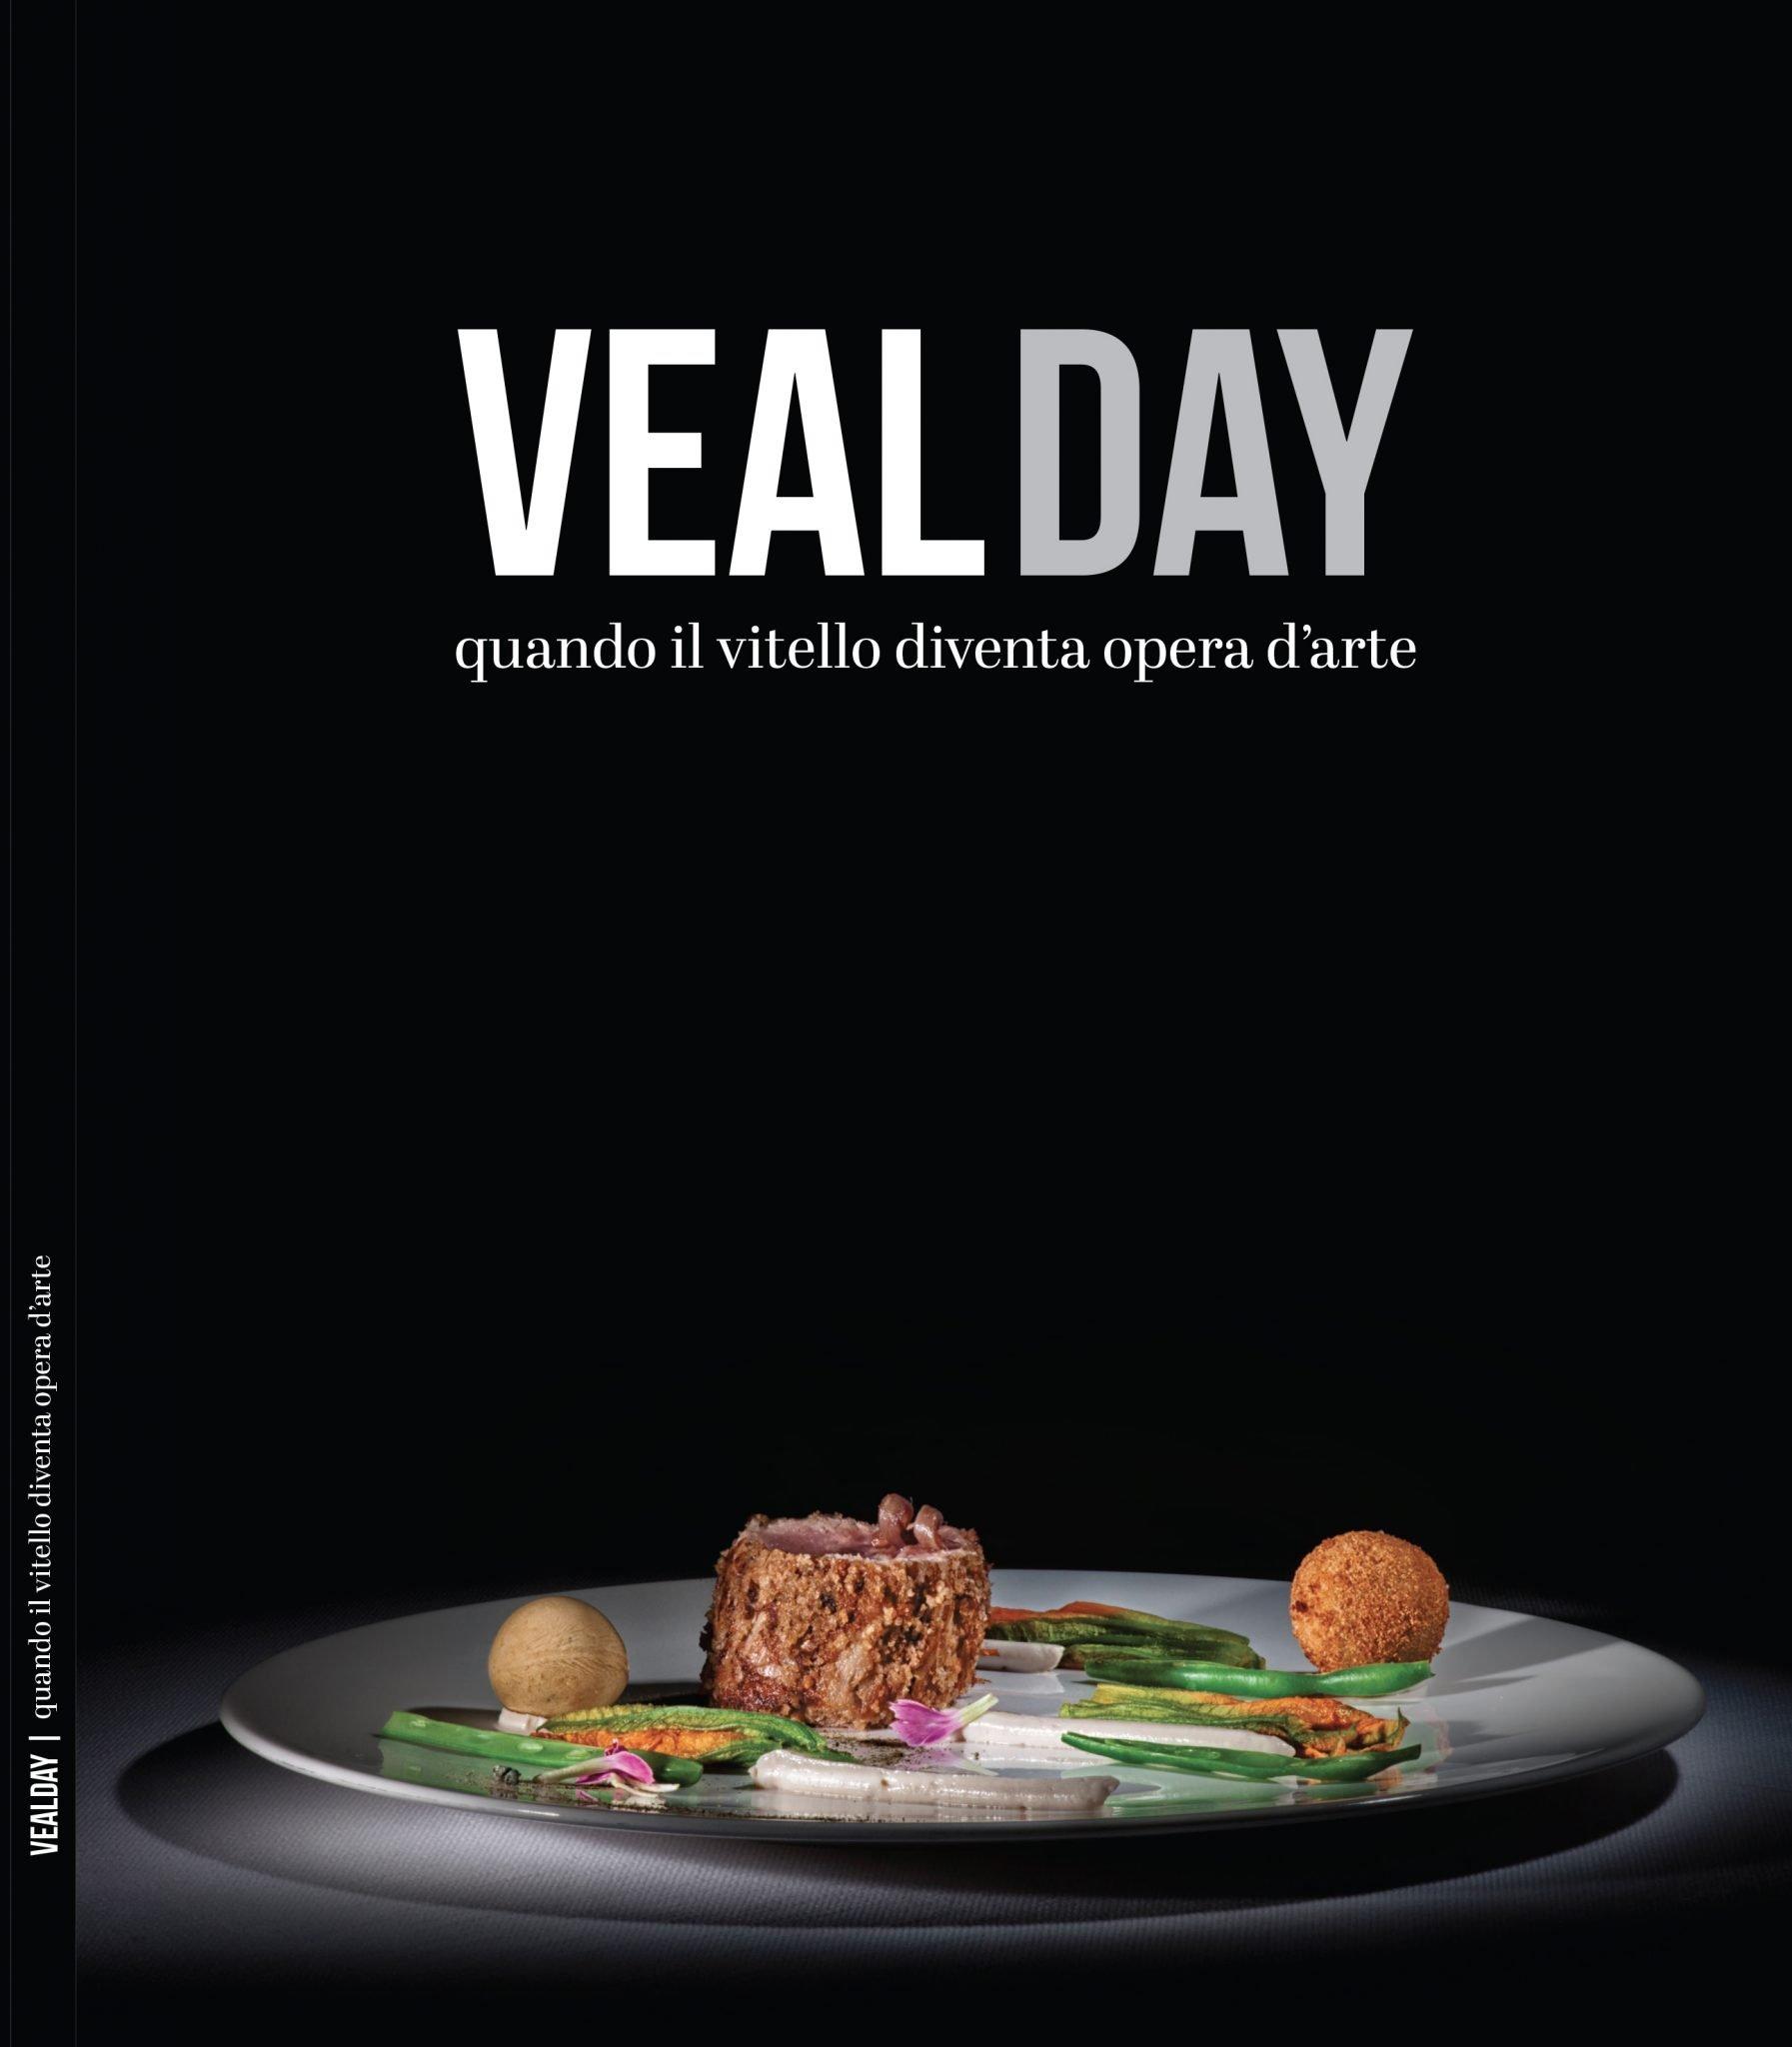 copertina_vealday_stampa